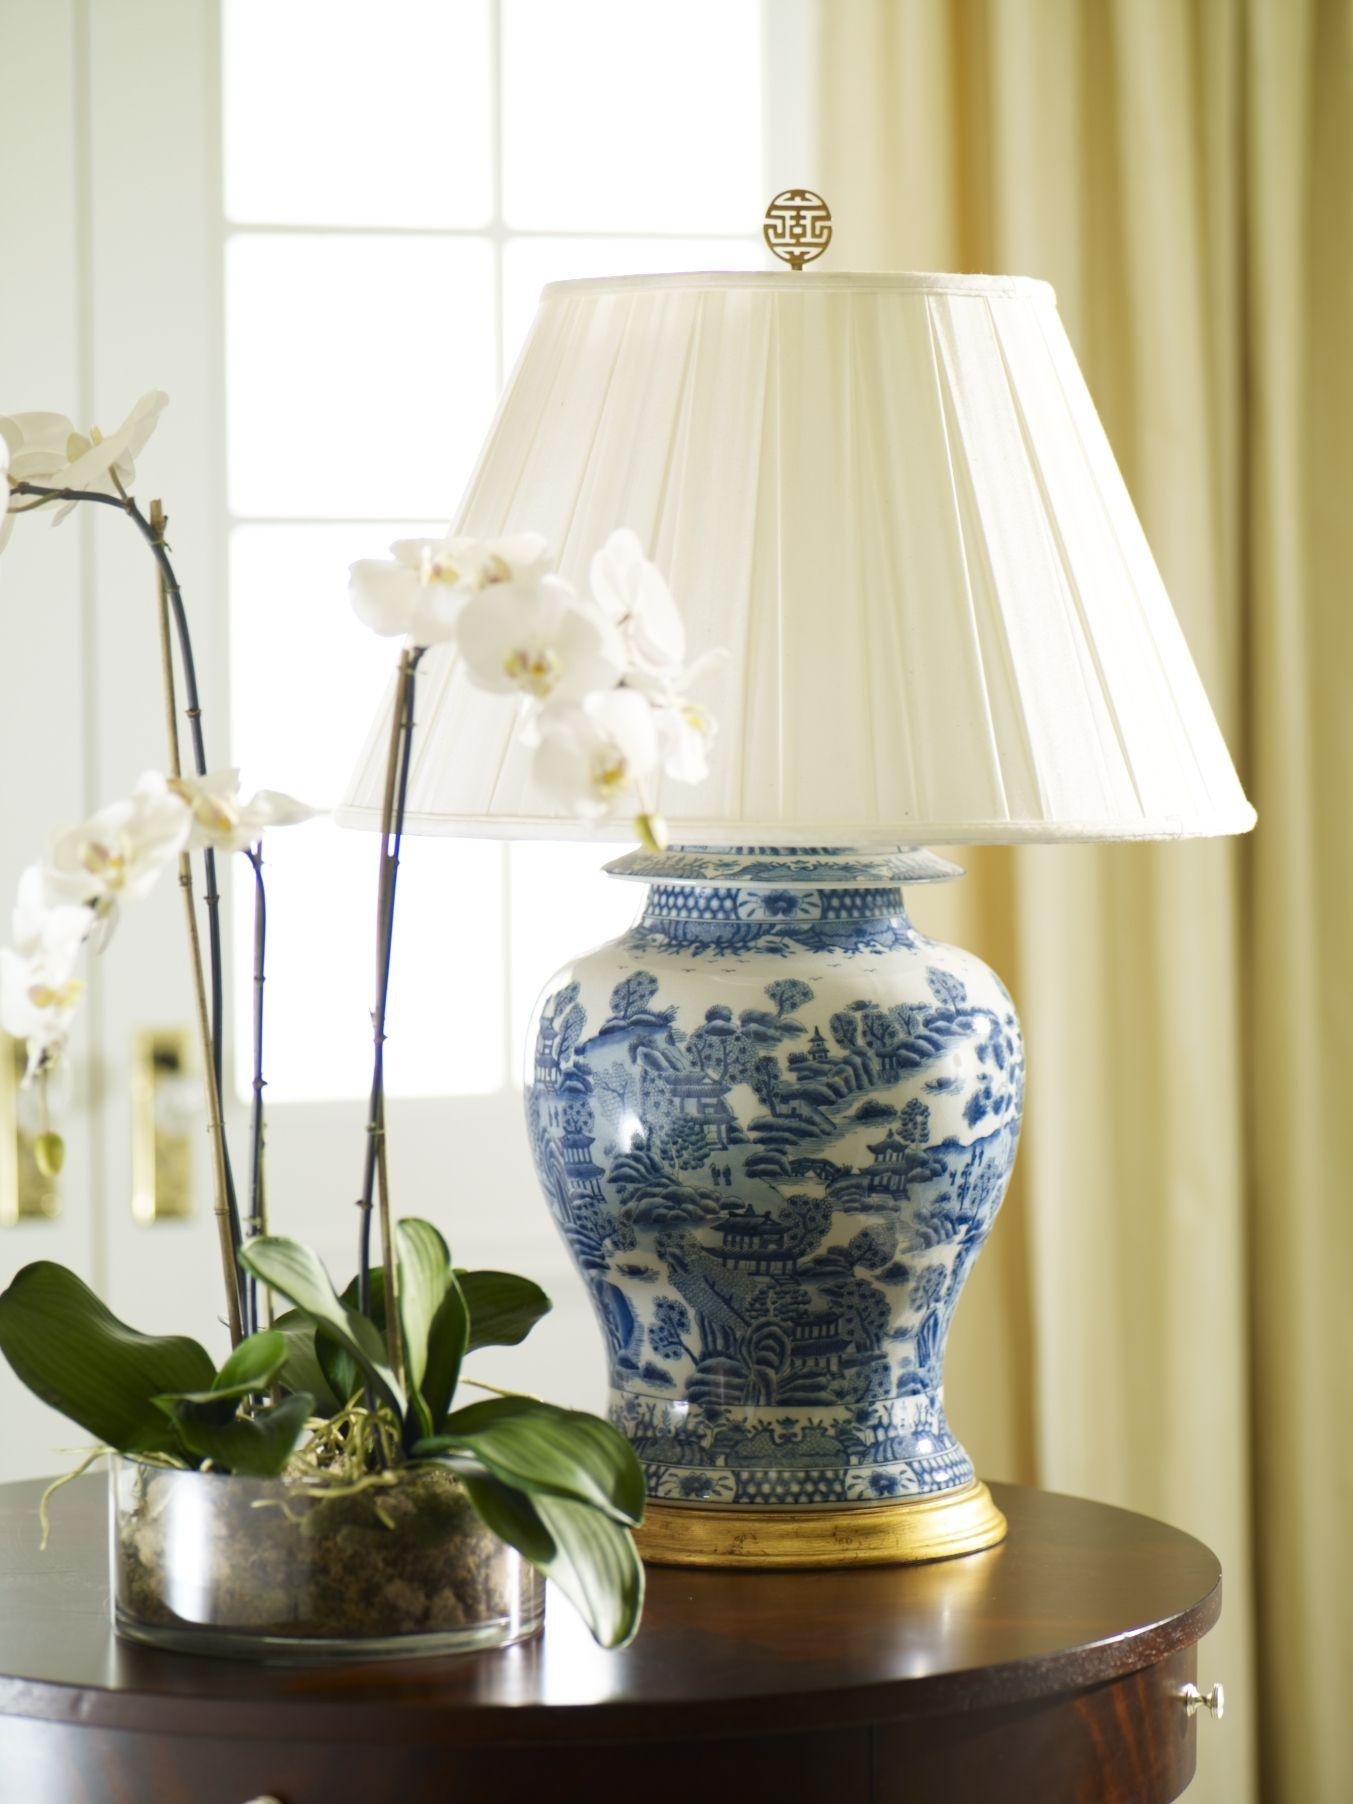 Classic Ginger Jar Table Lamp Ethan Allen Us Jar Table Lamp Blue And White Lamp Ginger Jar Lamp #white #living #room #lamps